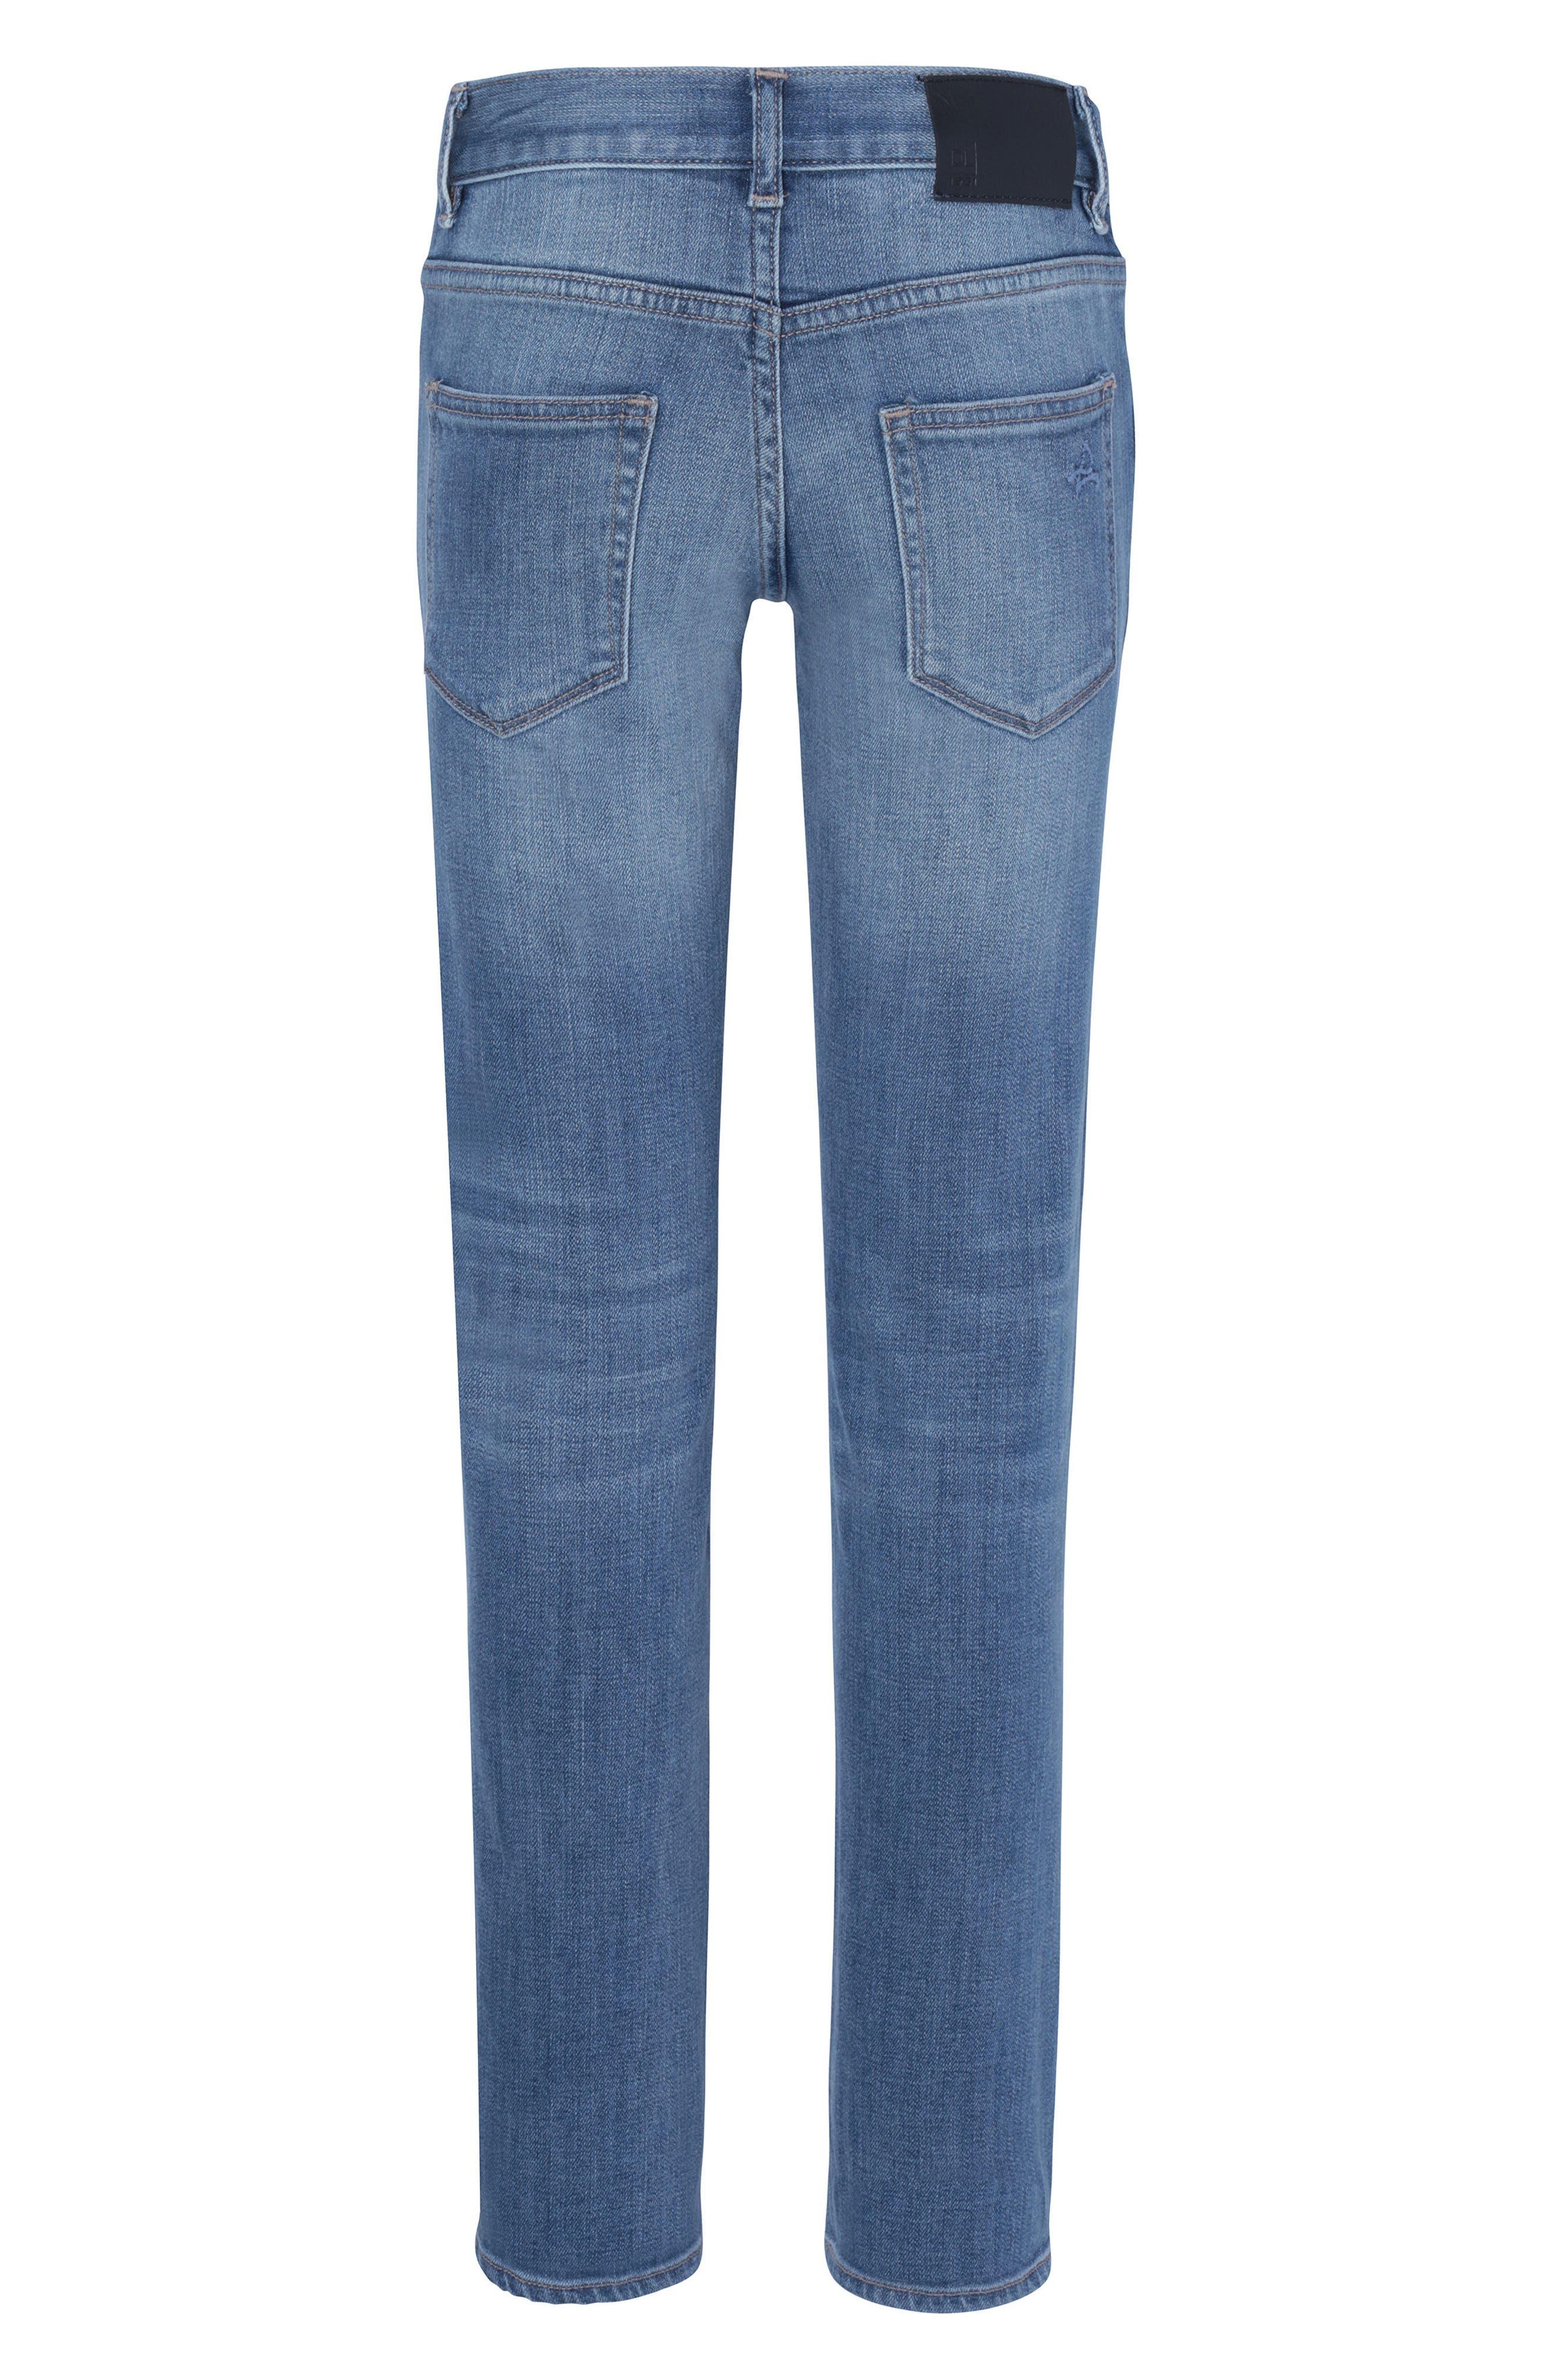 Brady Slim Fit Jeans,                             Alternate thumbnail 2, color,                             FRESH